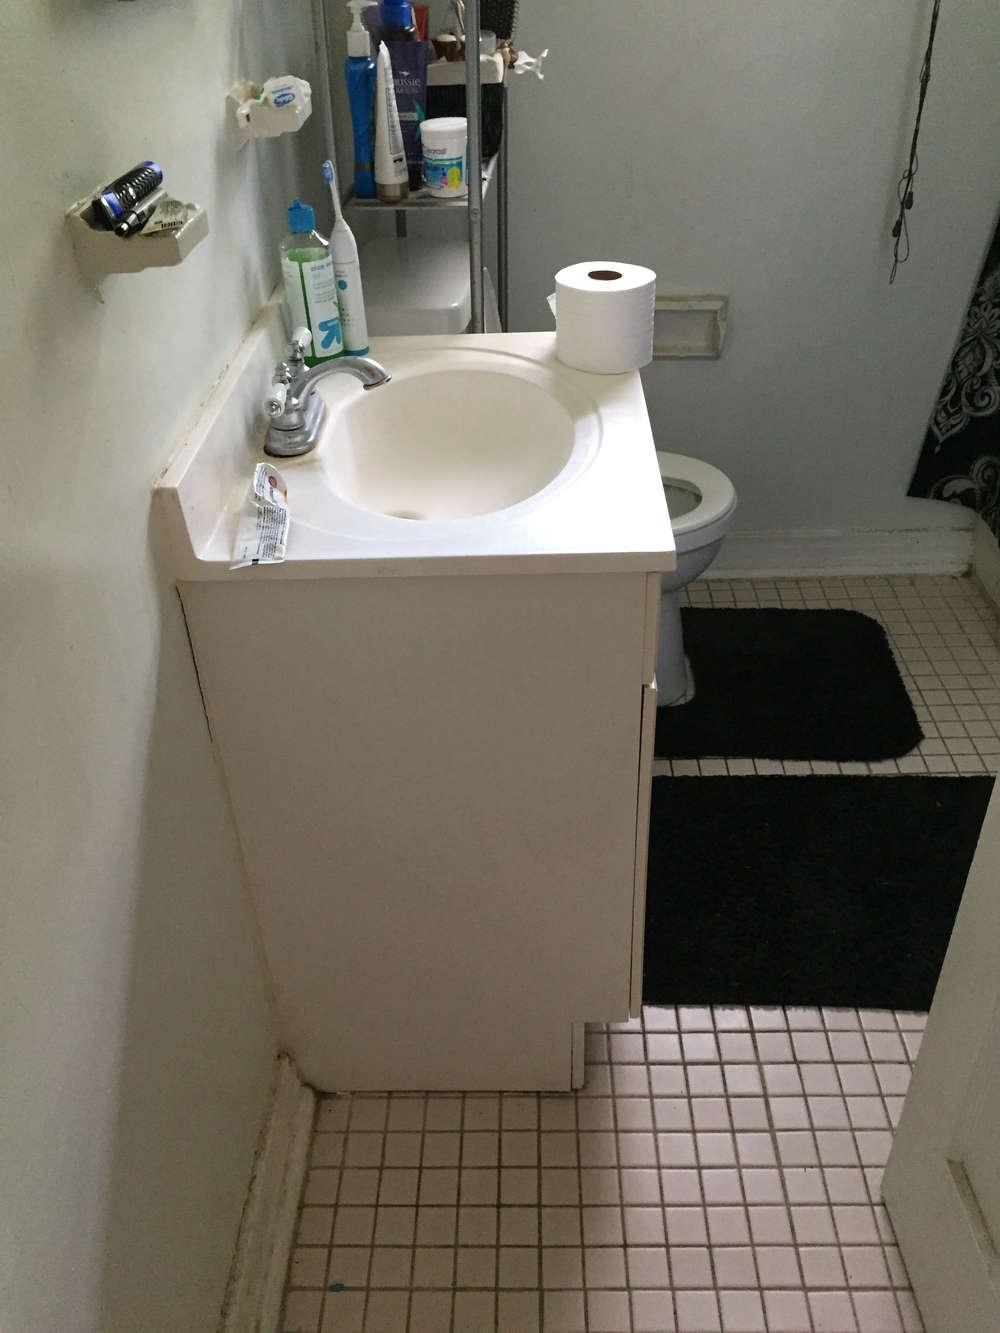 budget-remodel-bathroom-before-photo-white-sink-unit-tile-floor